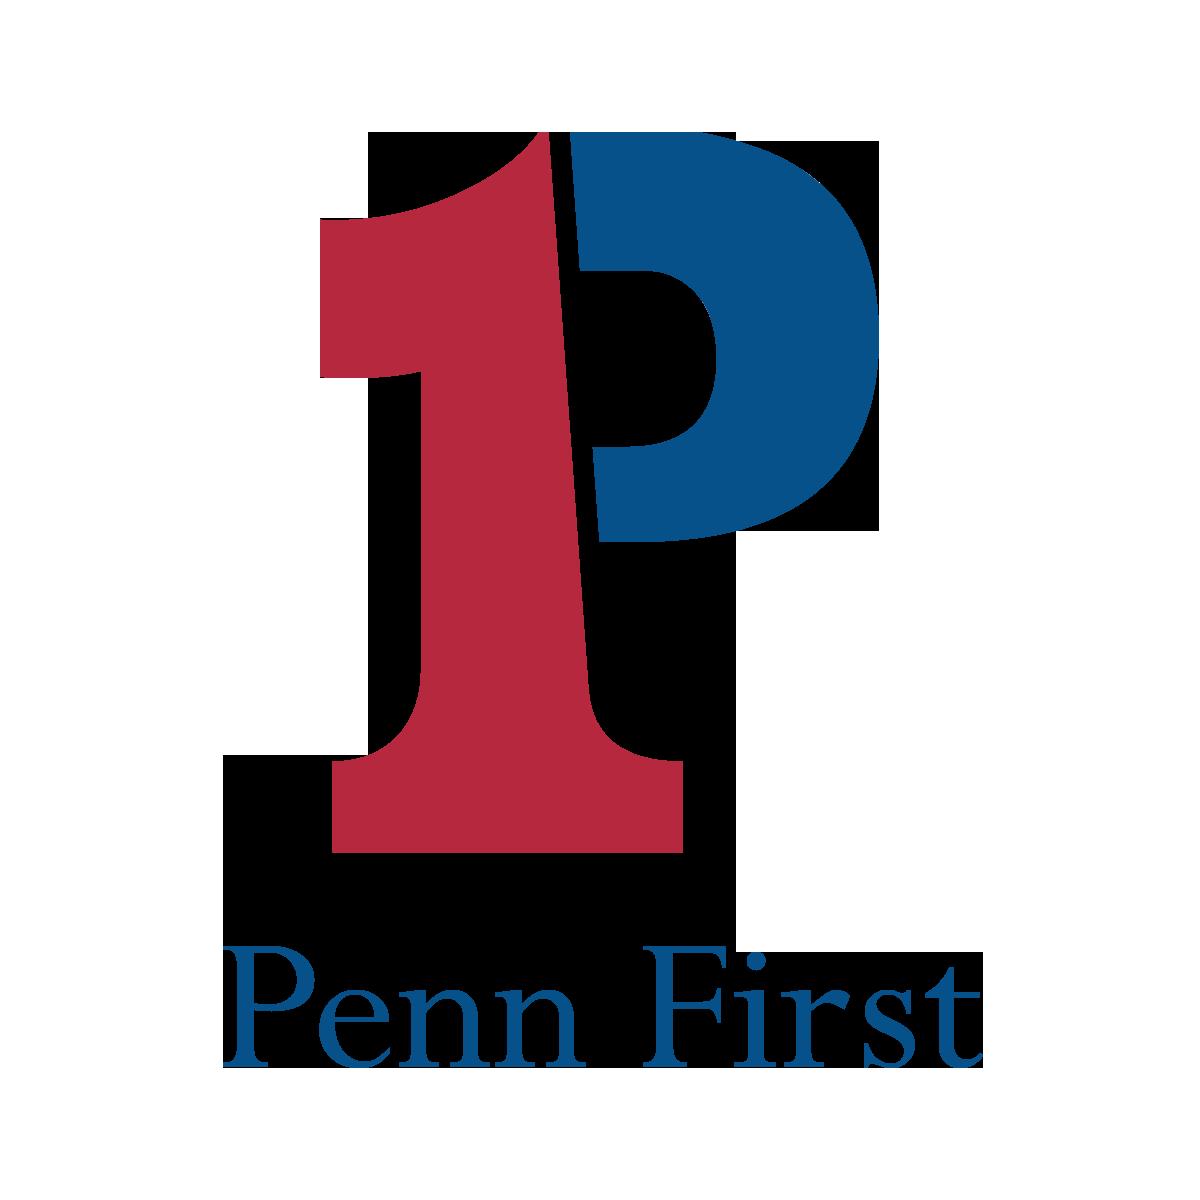 PennFirstLogo.png